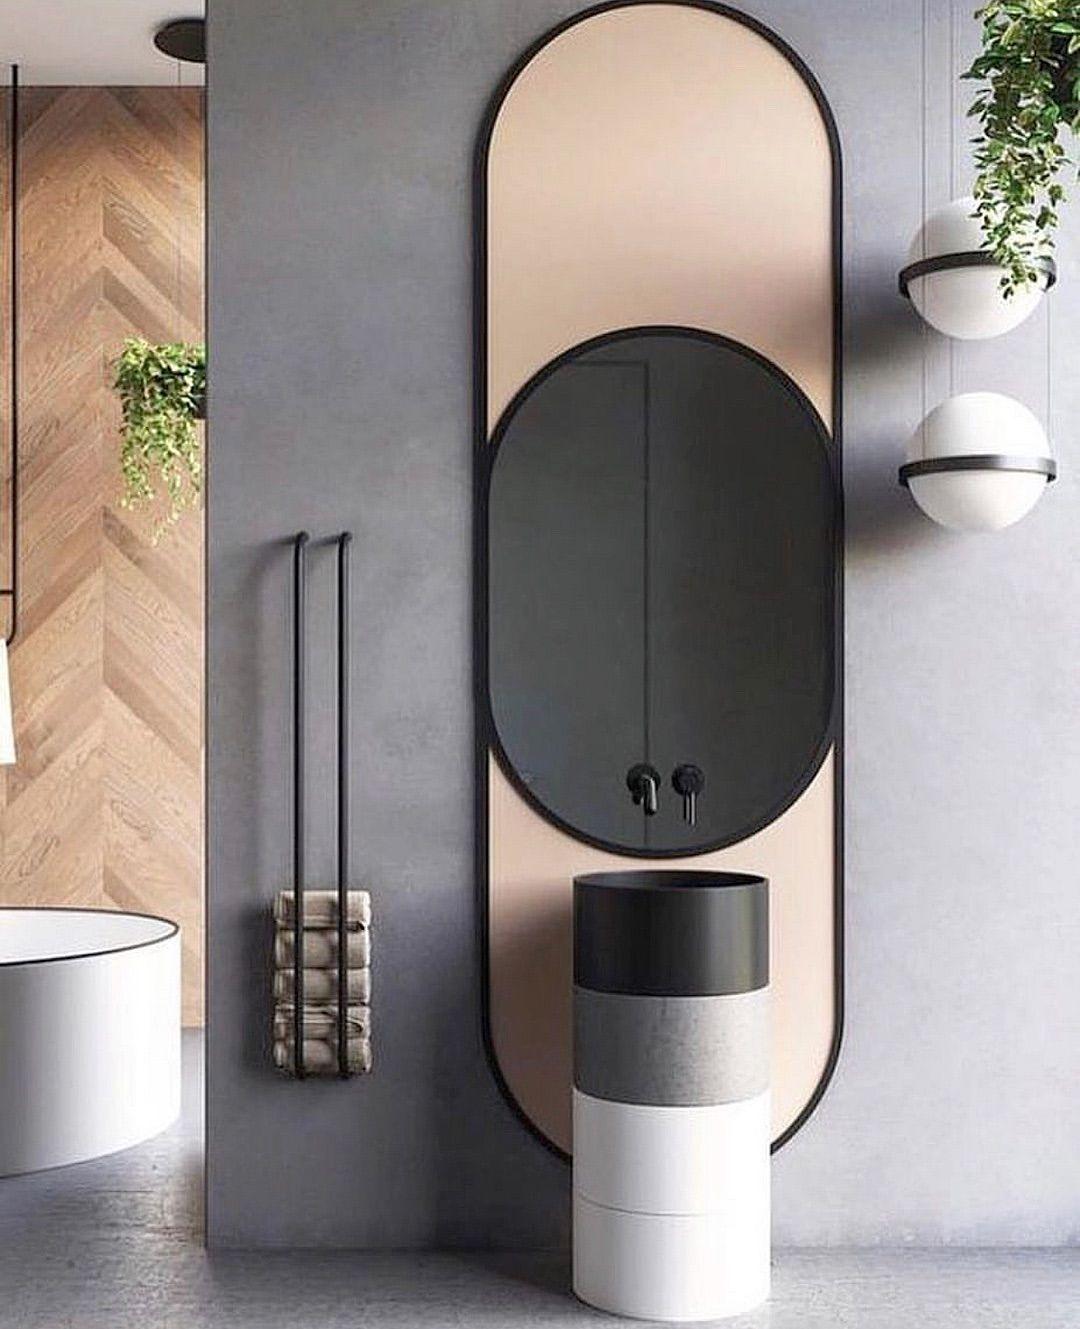 Luxury Bathrooms Toilet Design Minimalist Bathroom Bathroom Wall Decor